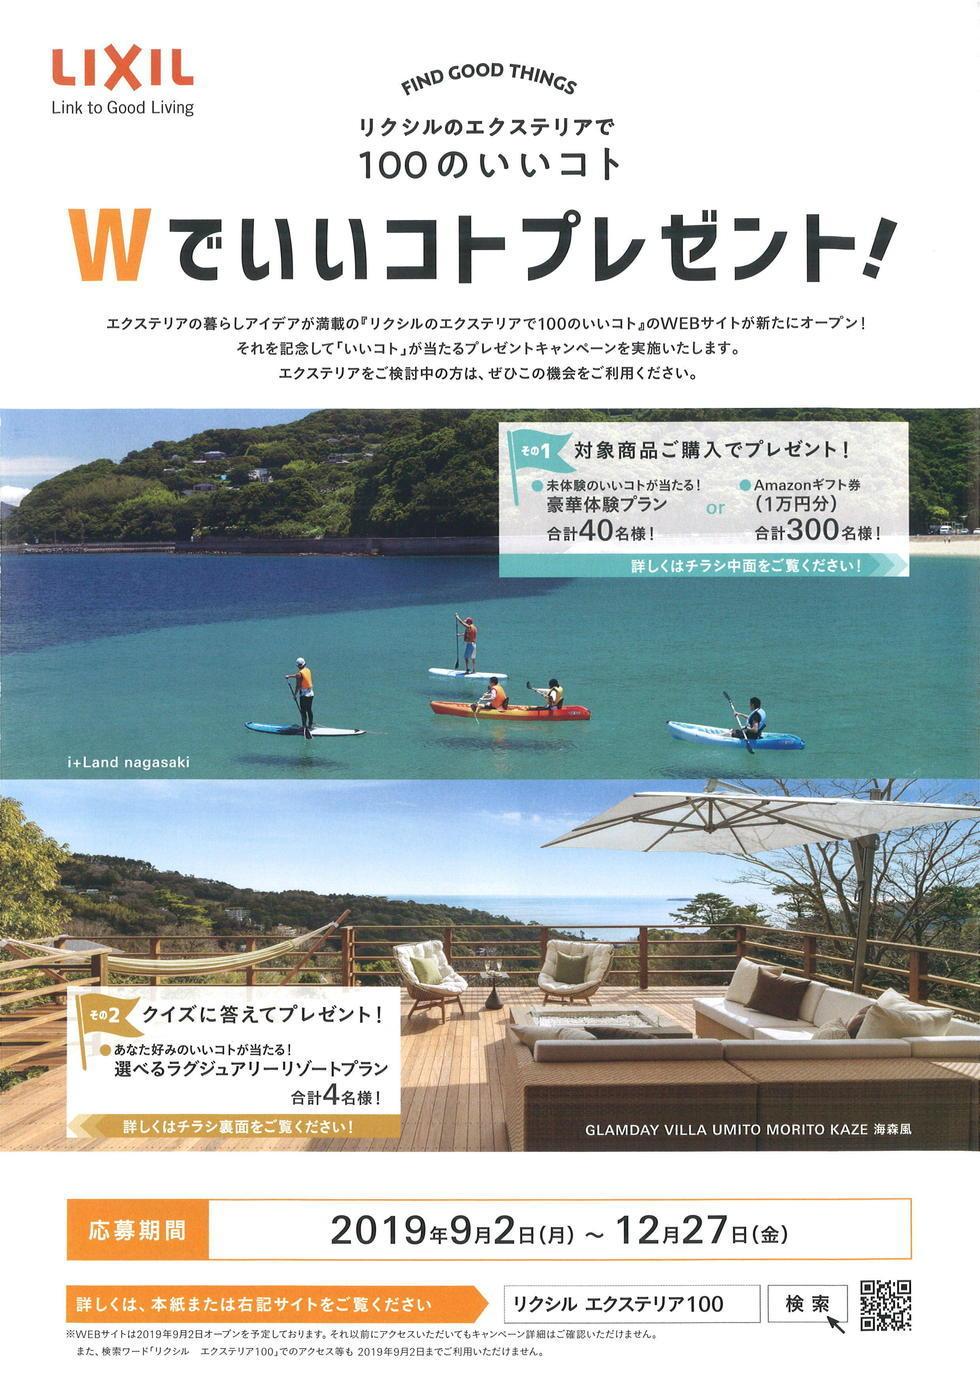 https://lixil-reformshop.jp/shop/SP00000598/assets_c/2019/09/6d1b217d11a3440c7e6fb081a5456027765bfd98-thumb-autox1386-305777.jpg